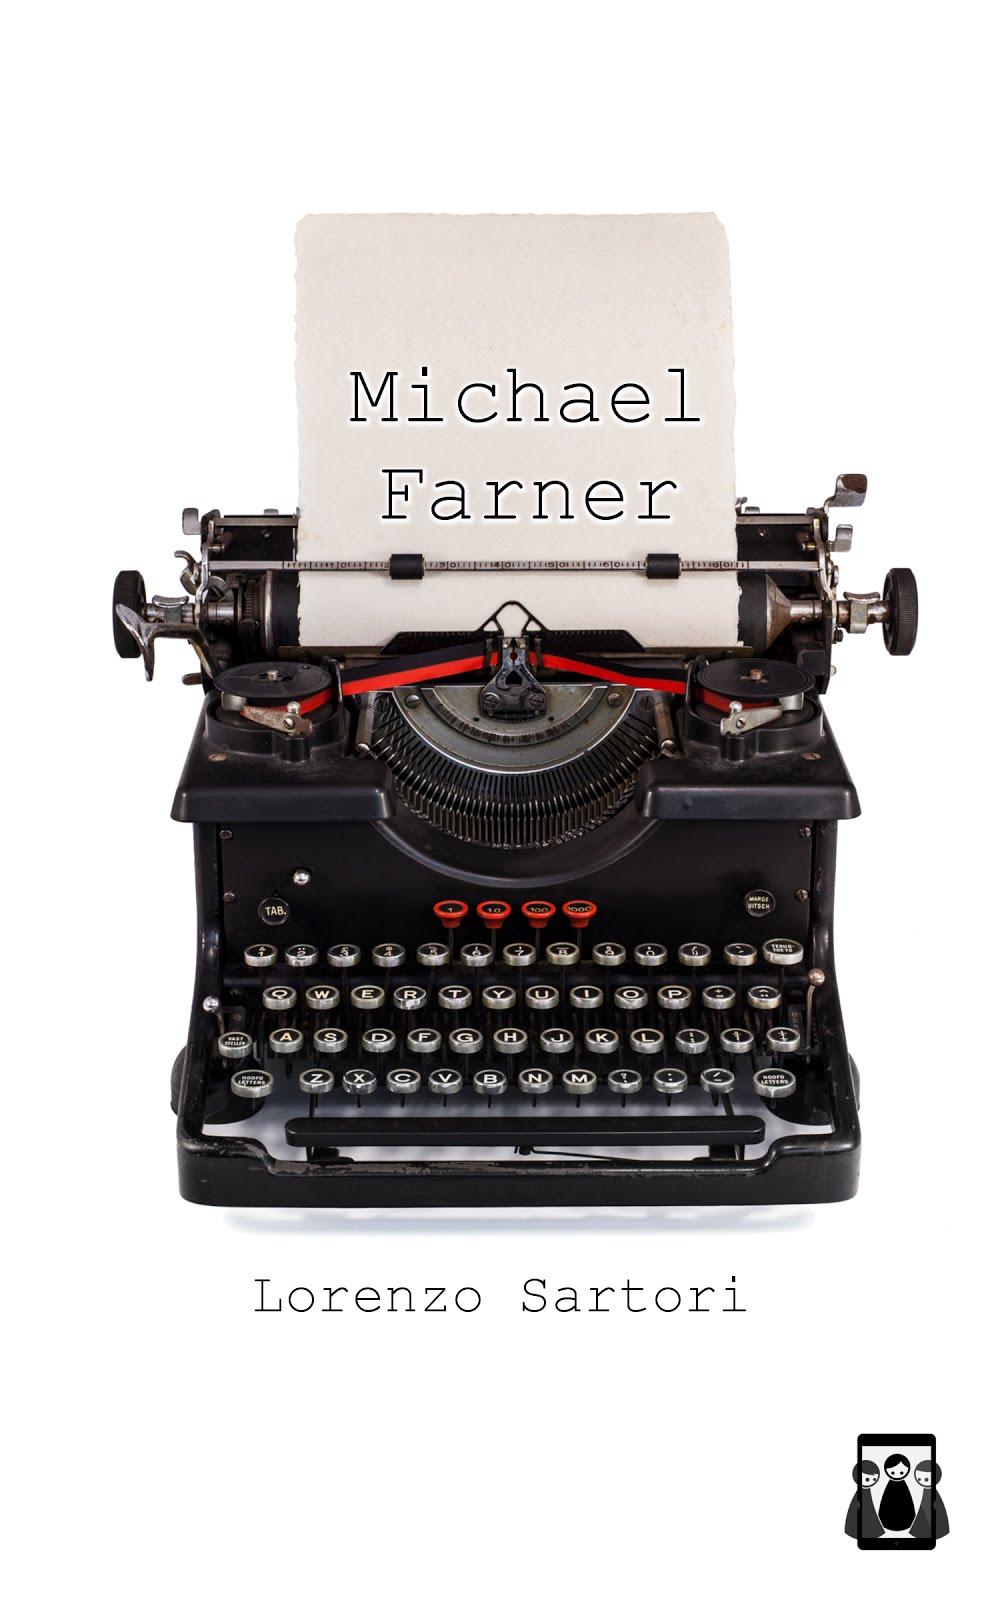 Michael Farner